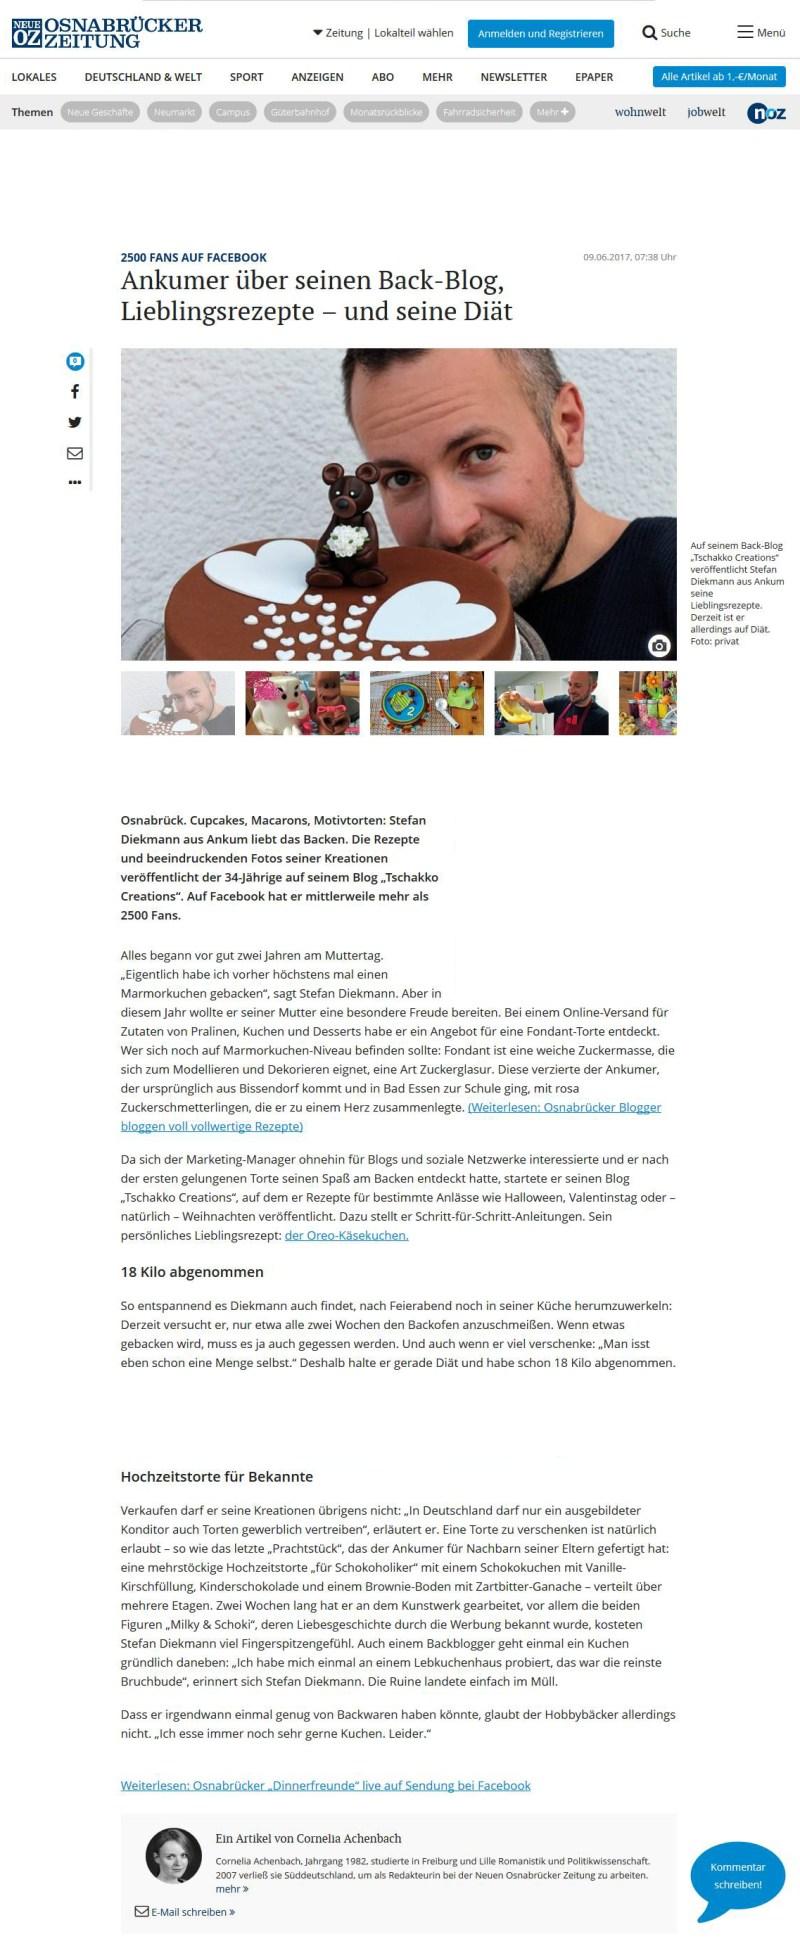 Neue Osnabrücker Zeitung online 09.06.2017